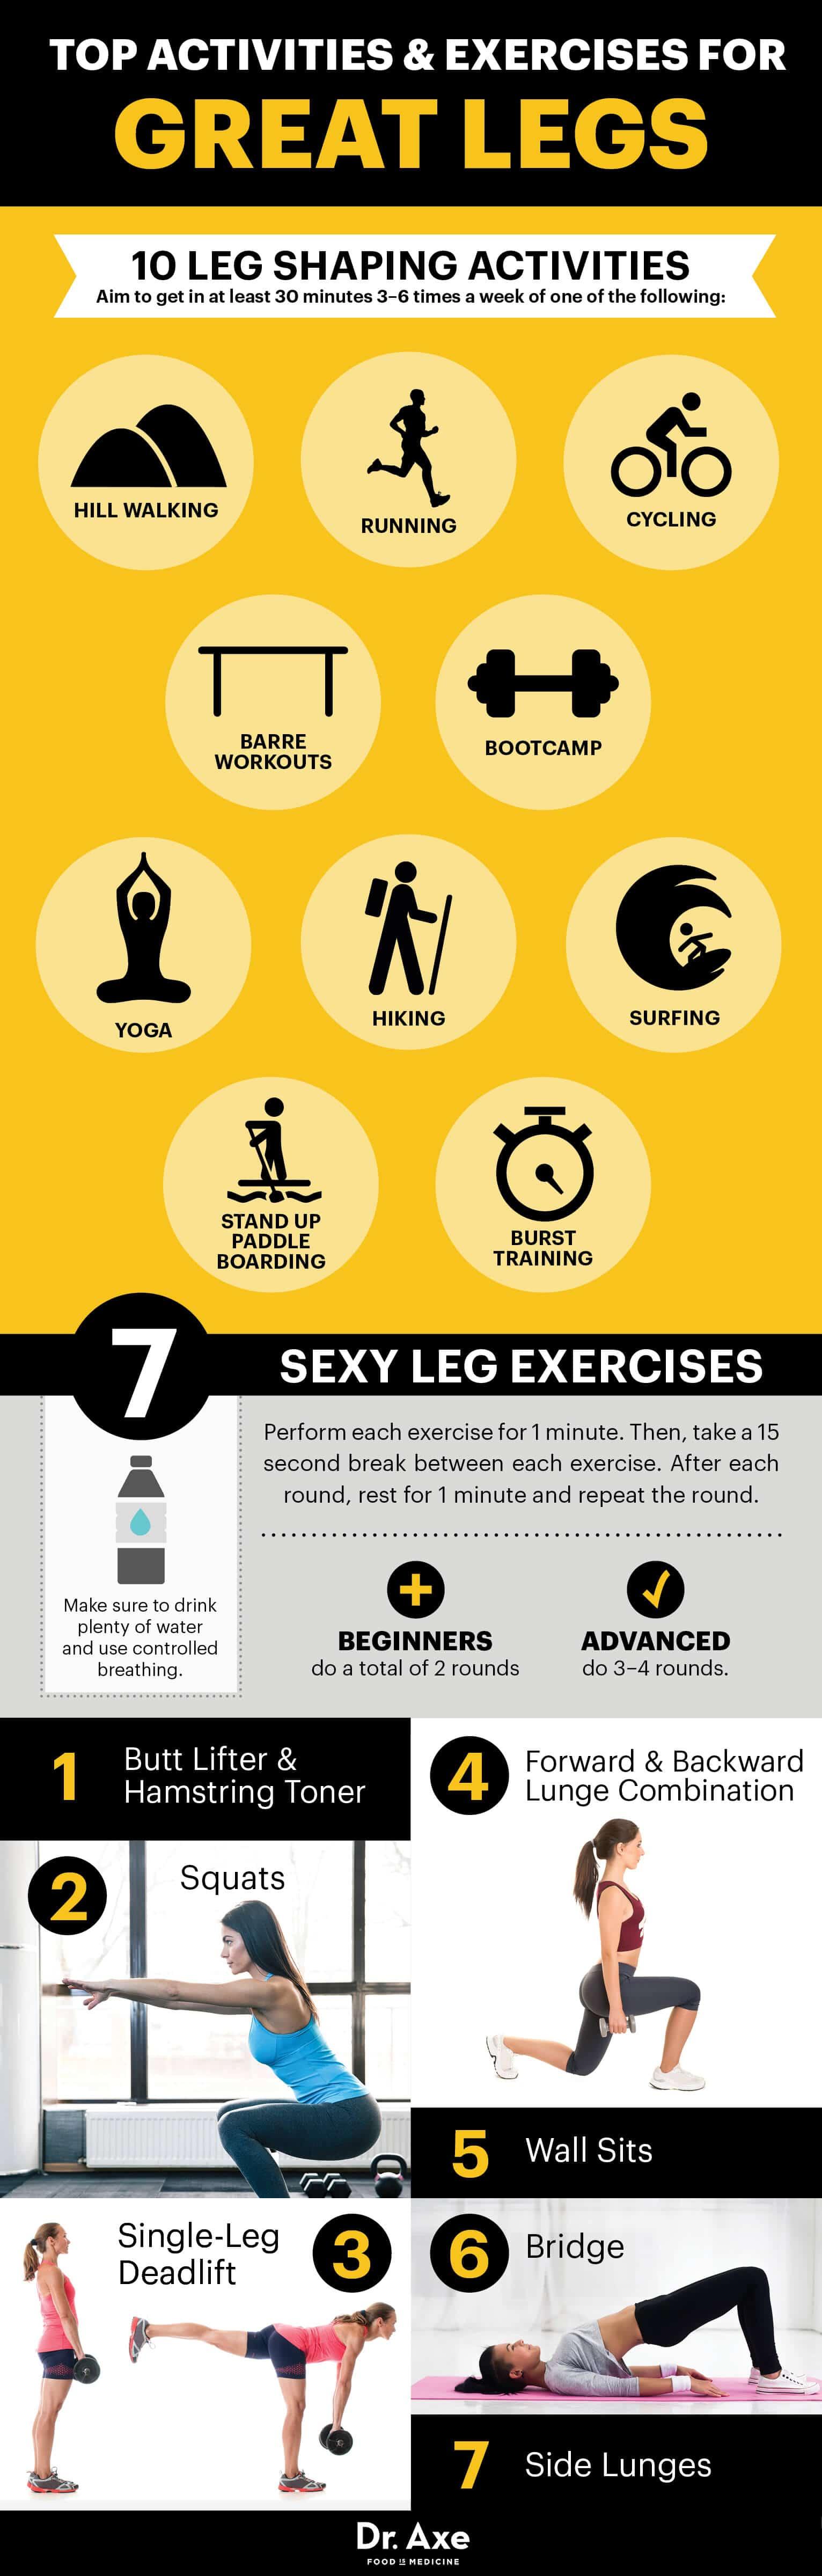 Leg workout - Dr. Axe